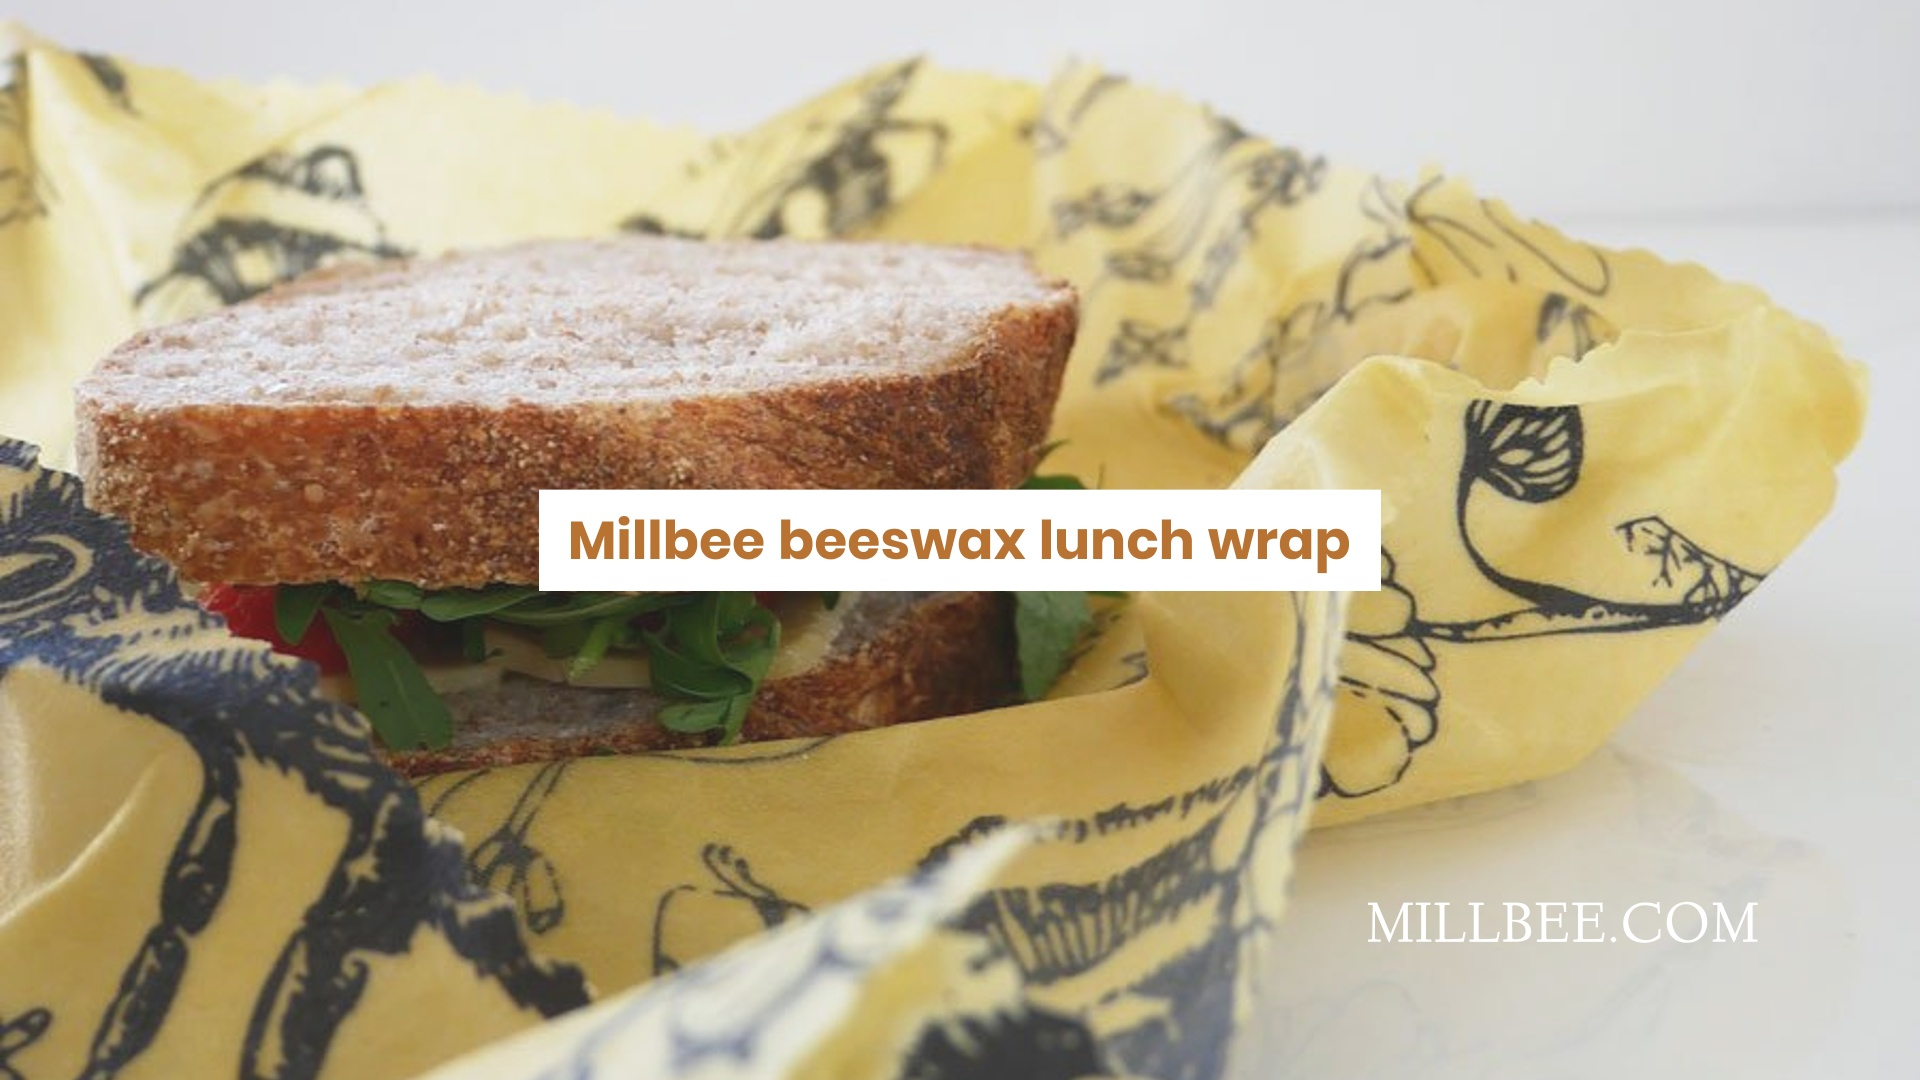 Millbee Beeswax Wraps Video - youtube